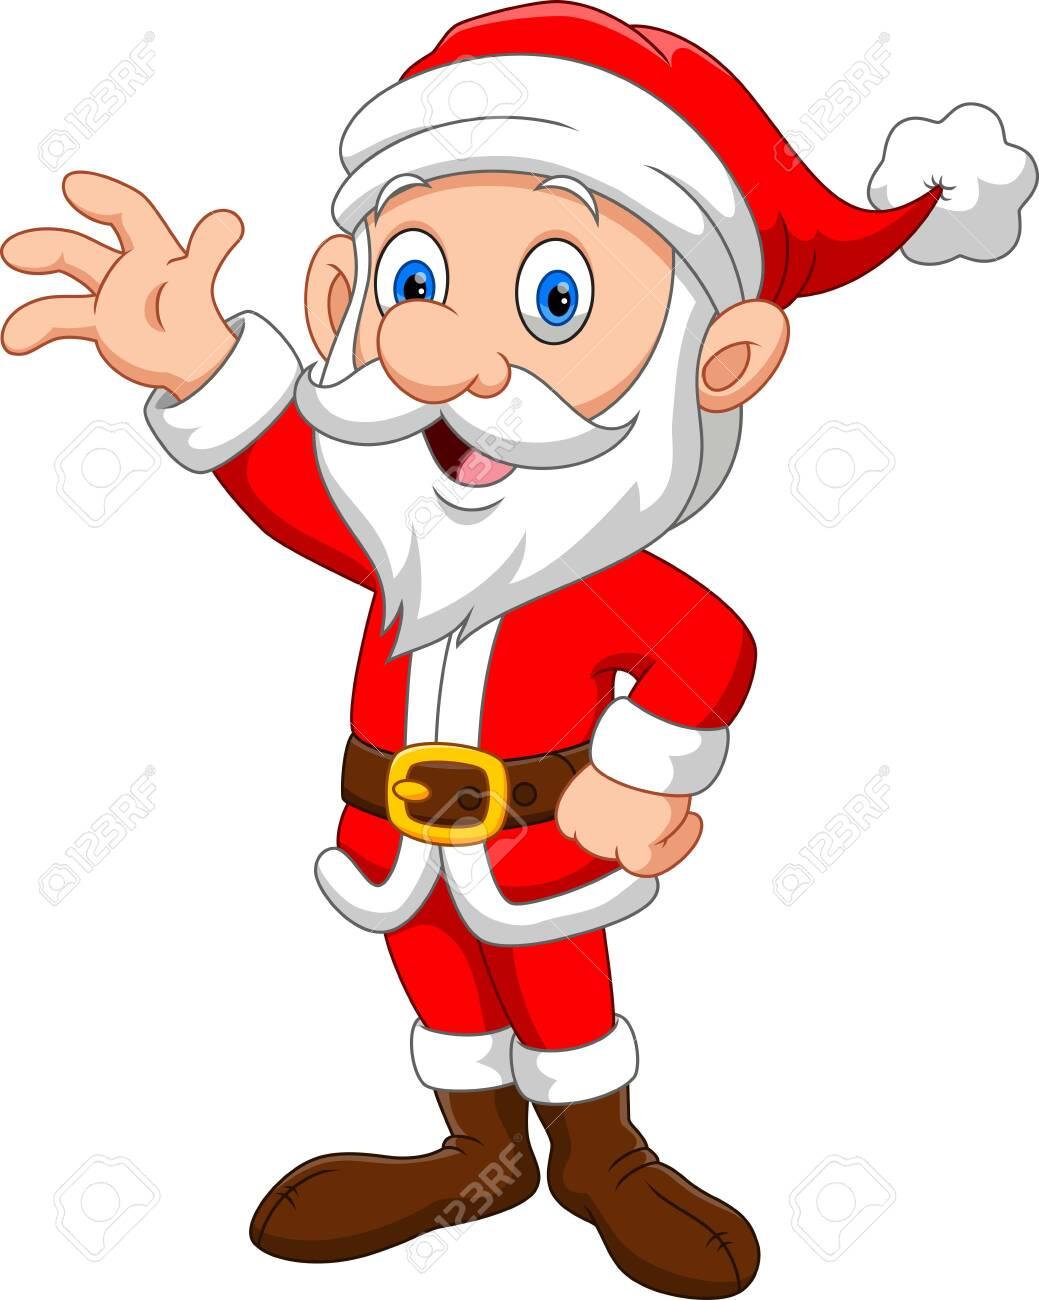 Illustration of Happy Santa Claus cartoon - 135377143